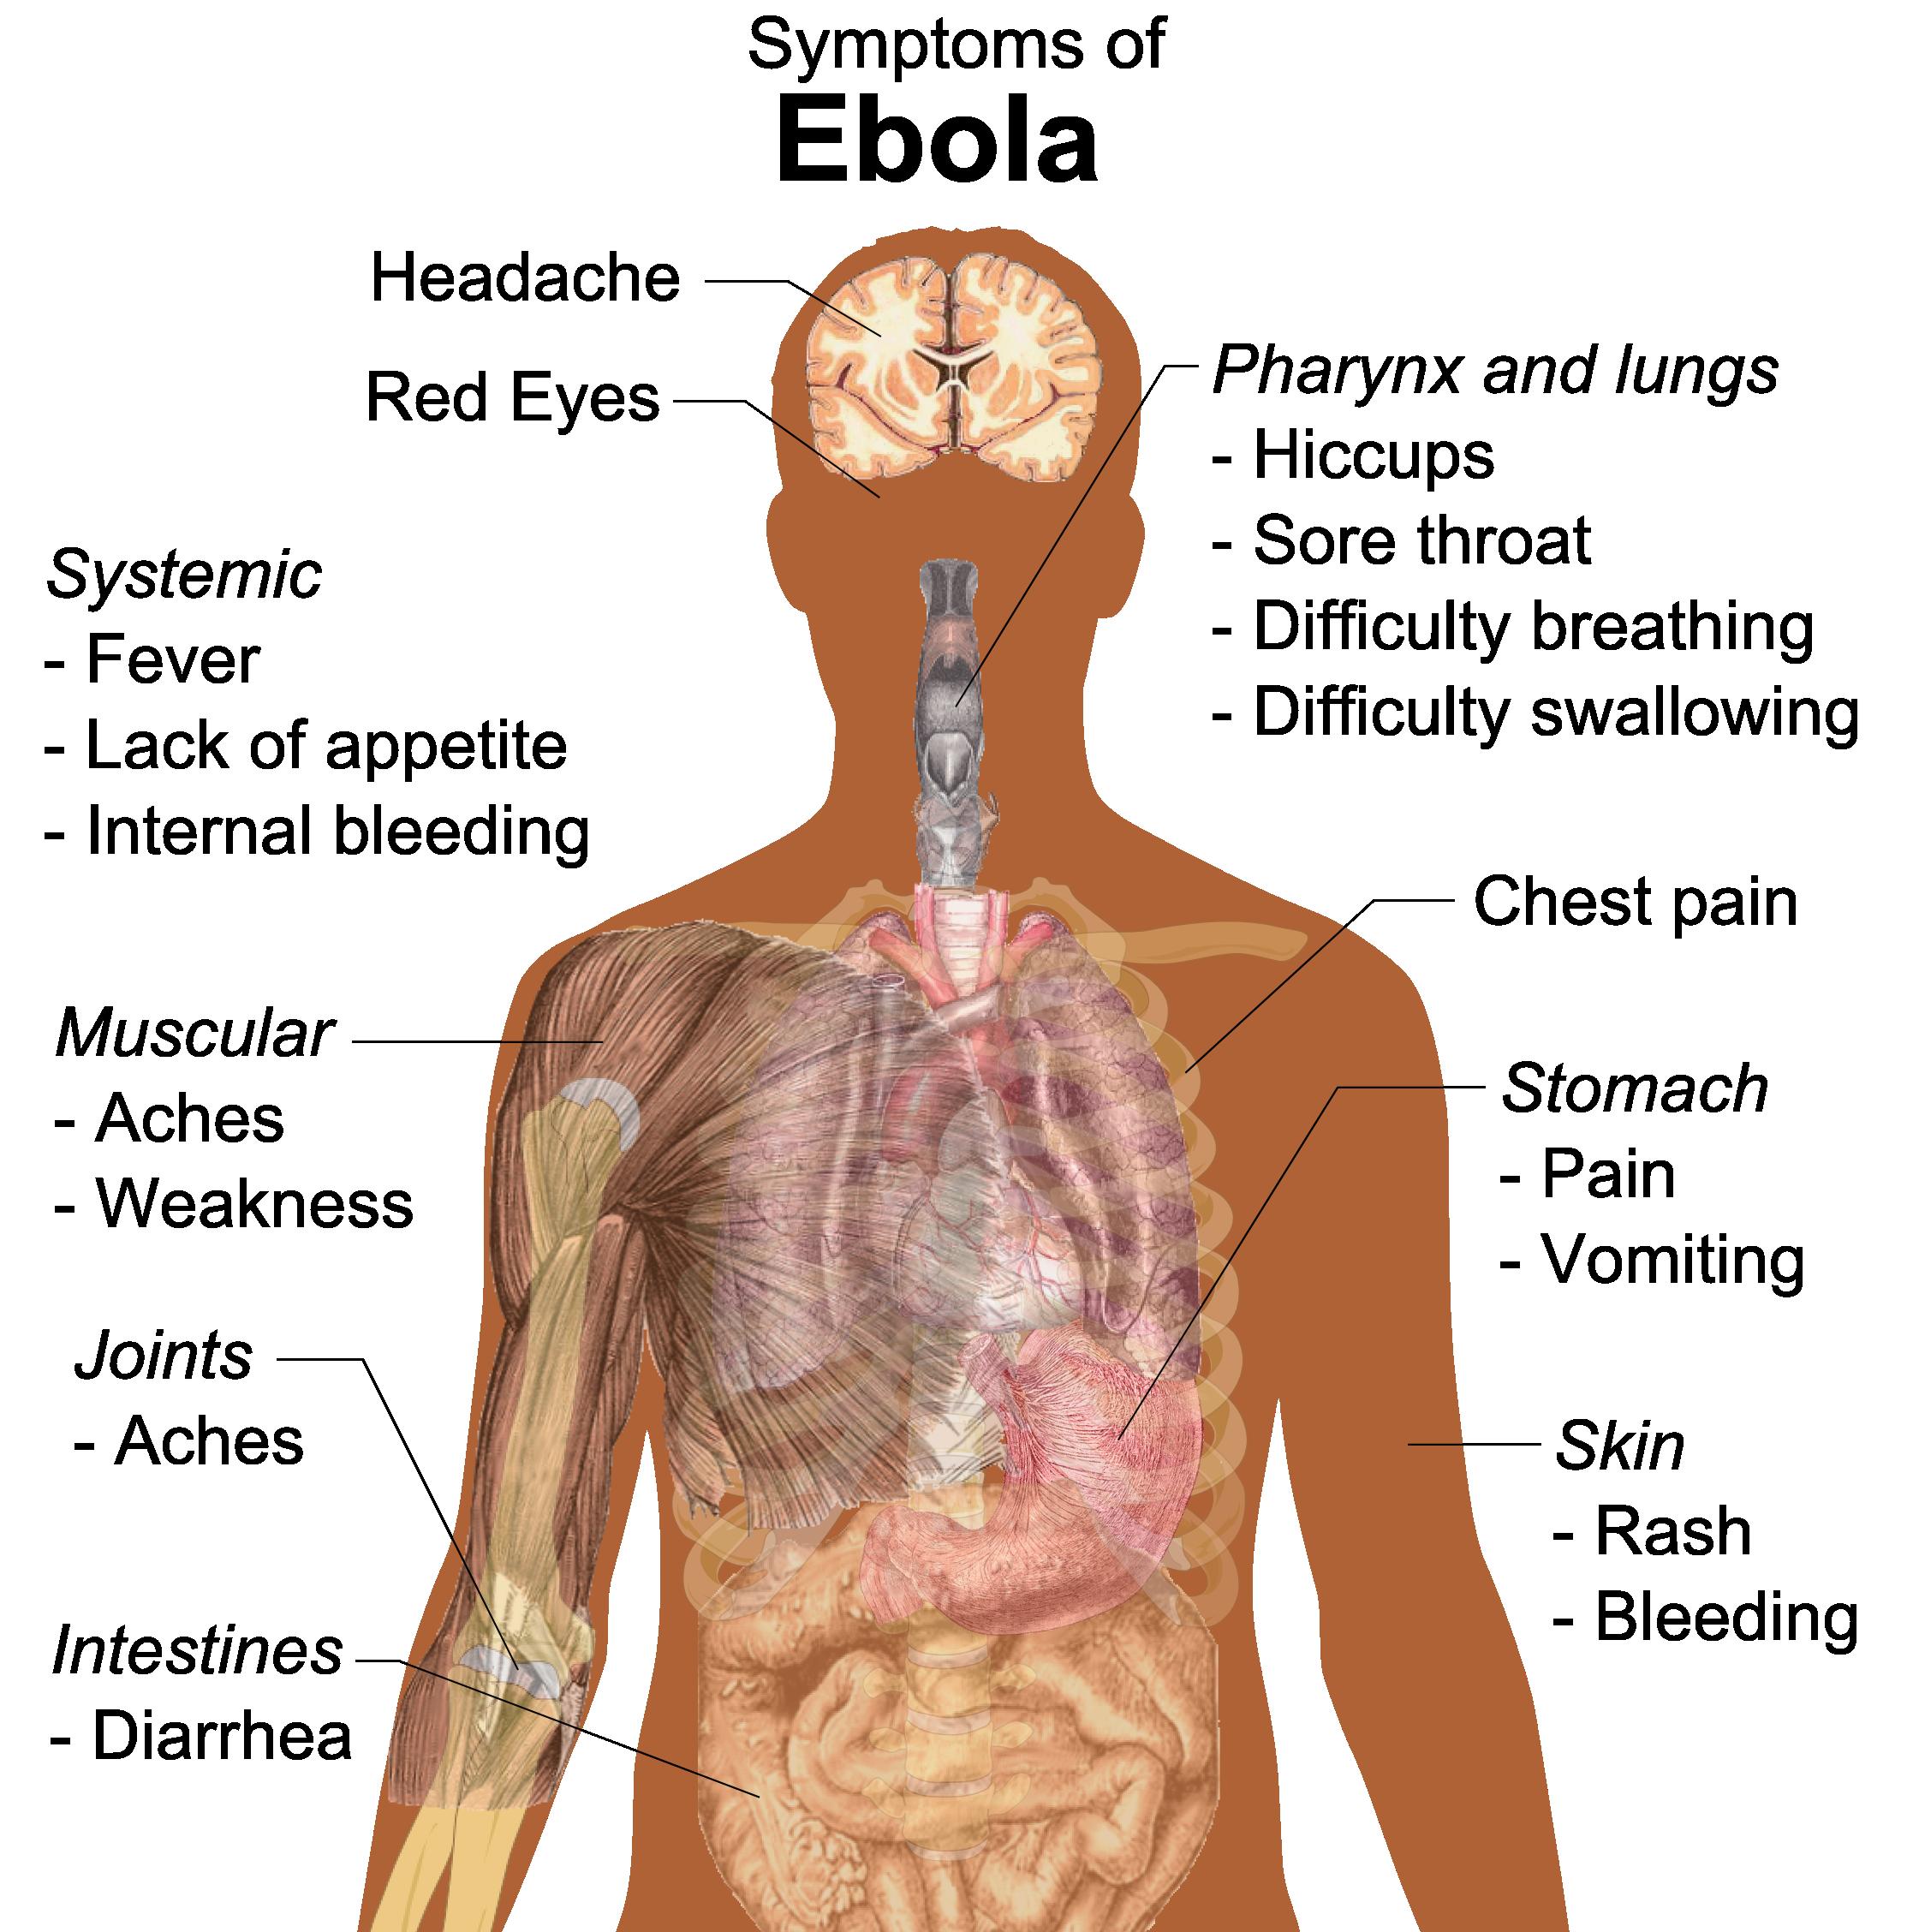 graphic freeuse download ebola vector symptoms #96097763